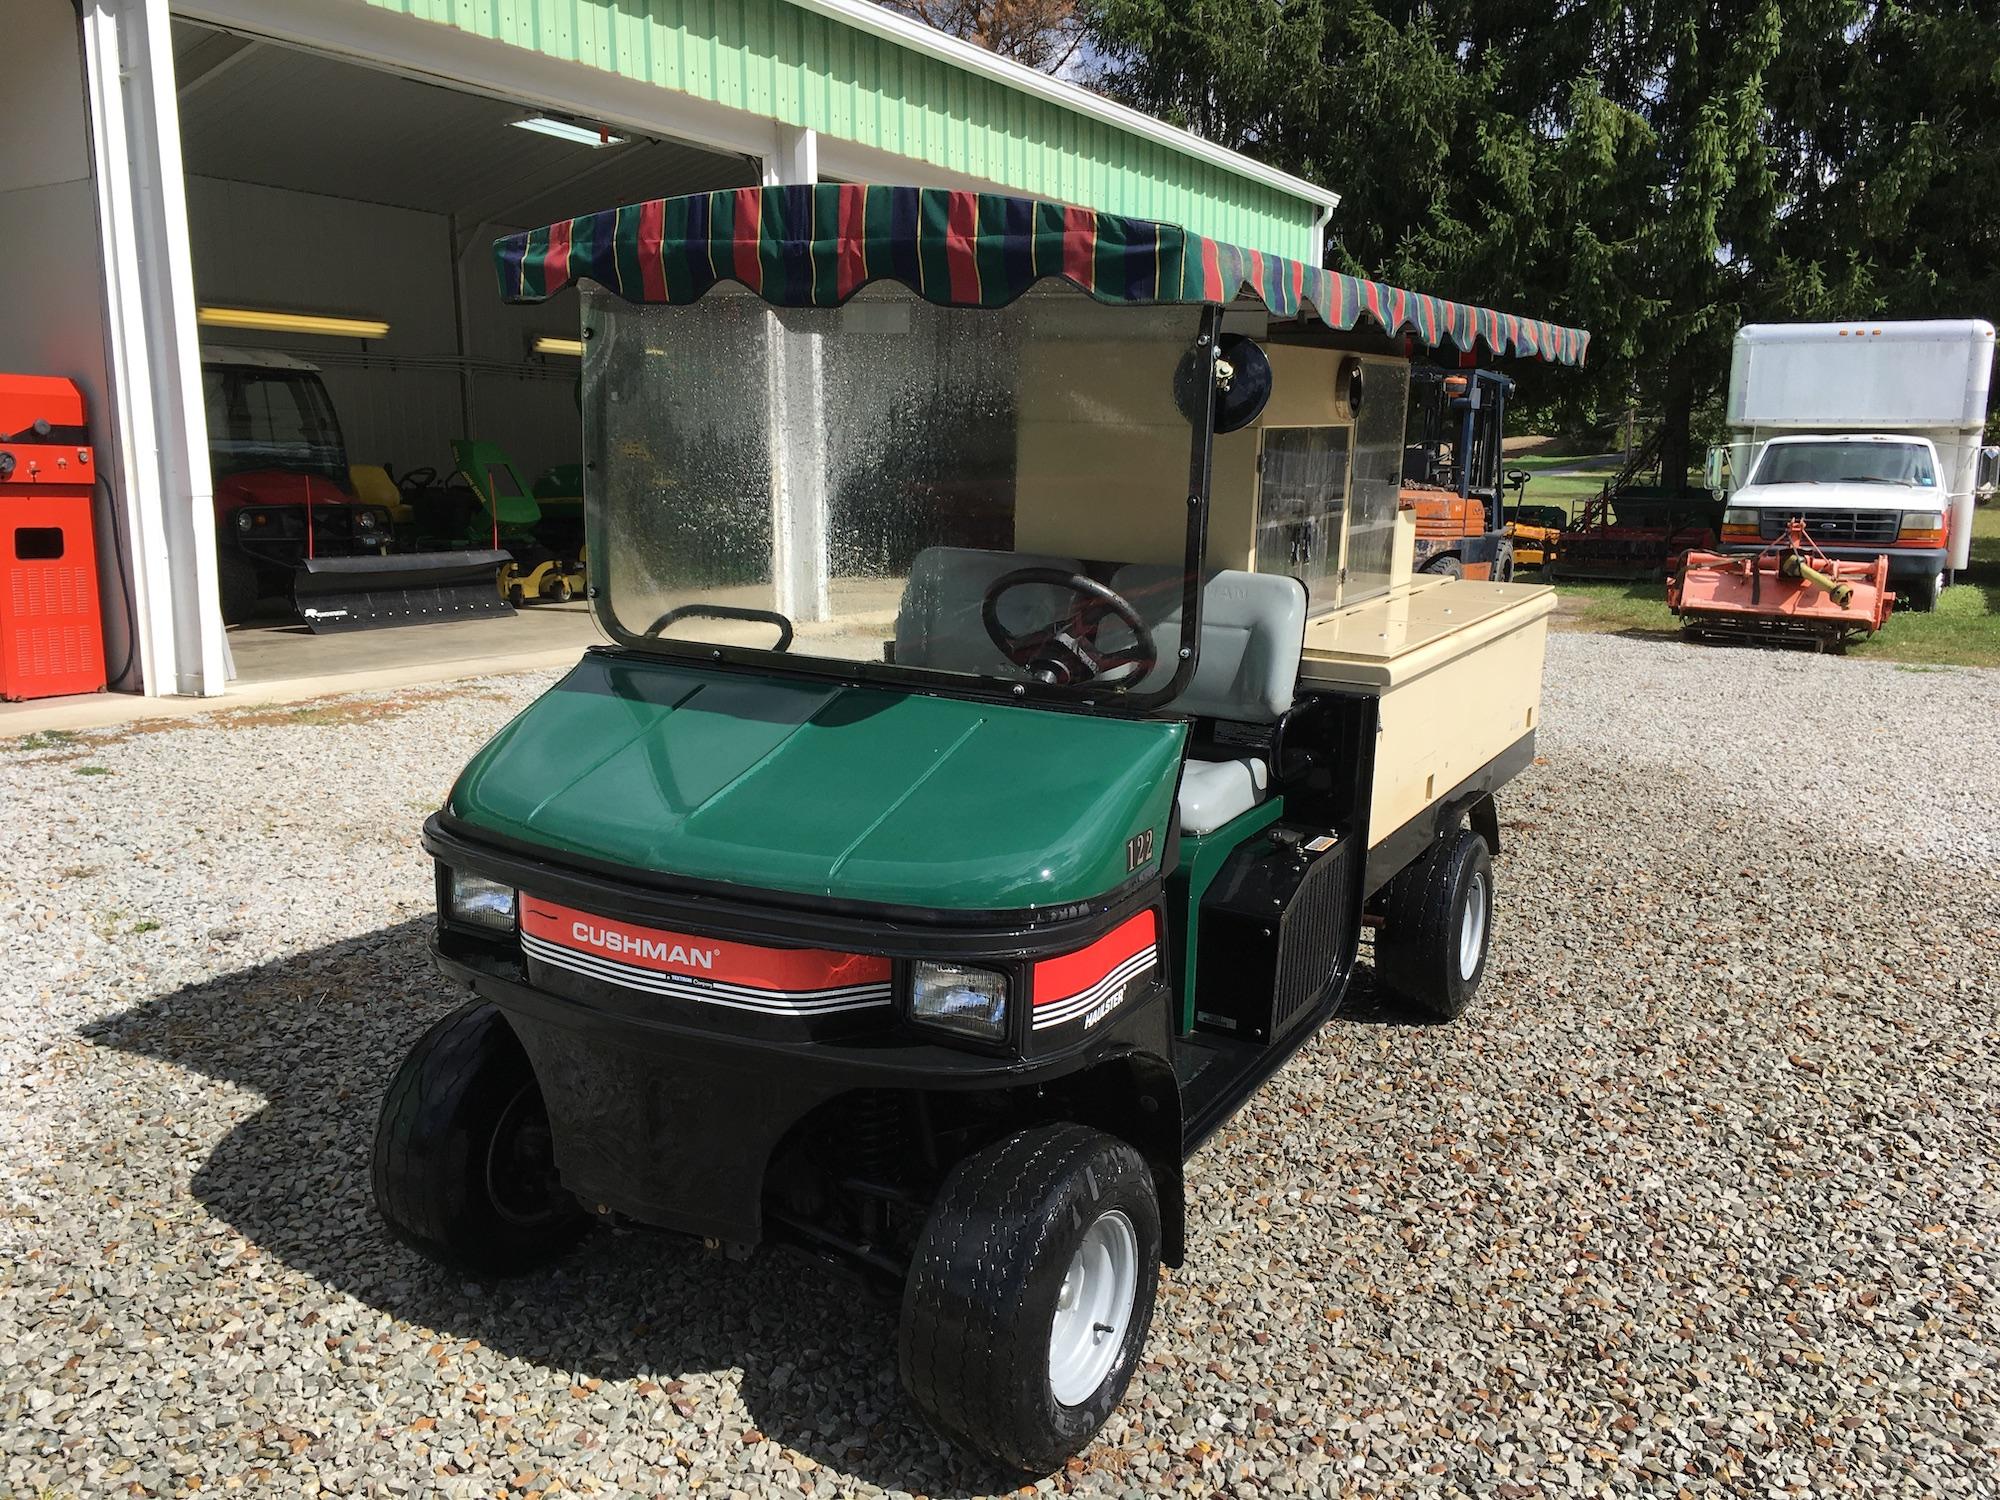 Cushman-Haulster-Beverage-Cart-03